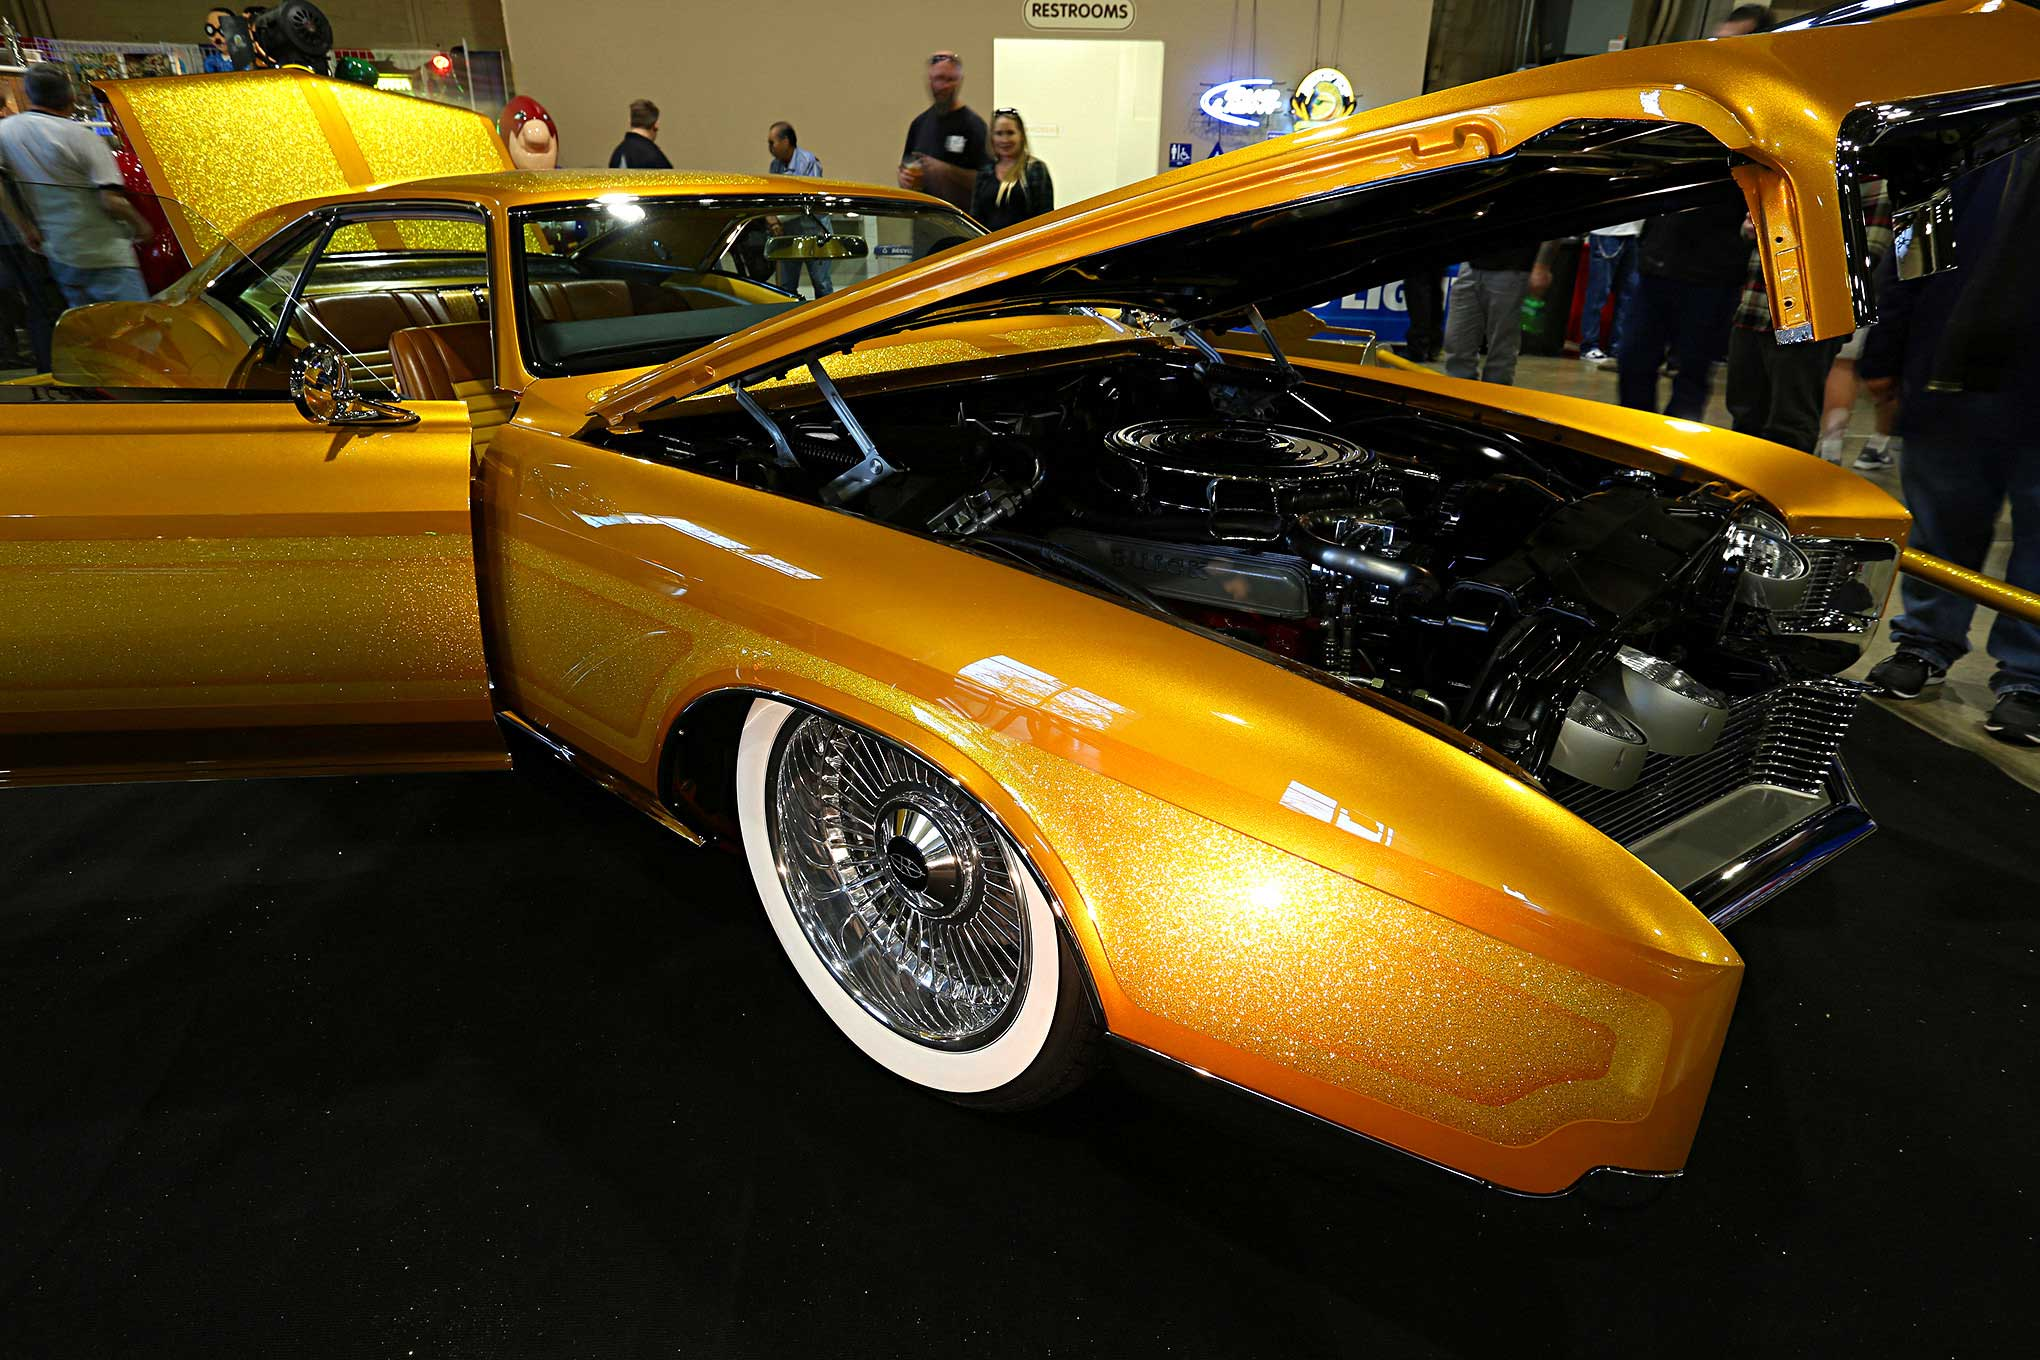 2017 Buick Grand National >> Hot Rods & Custom Stuff's Riviera GS - GNRS 2017 Spotlight